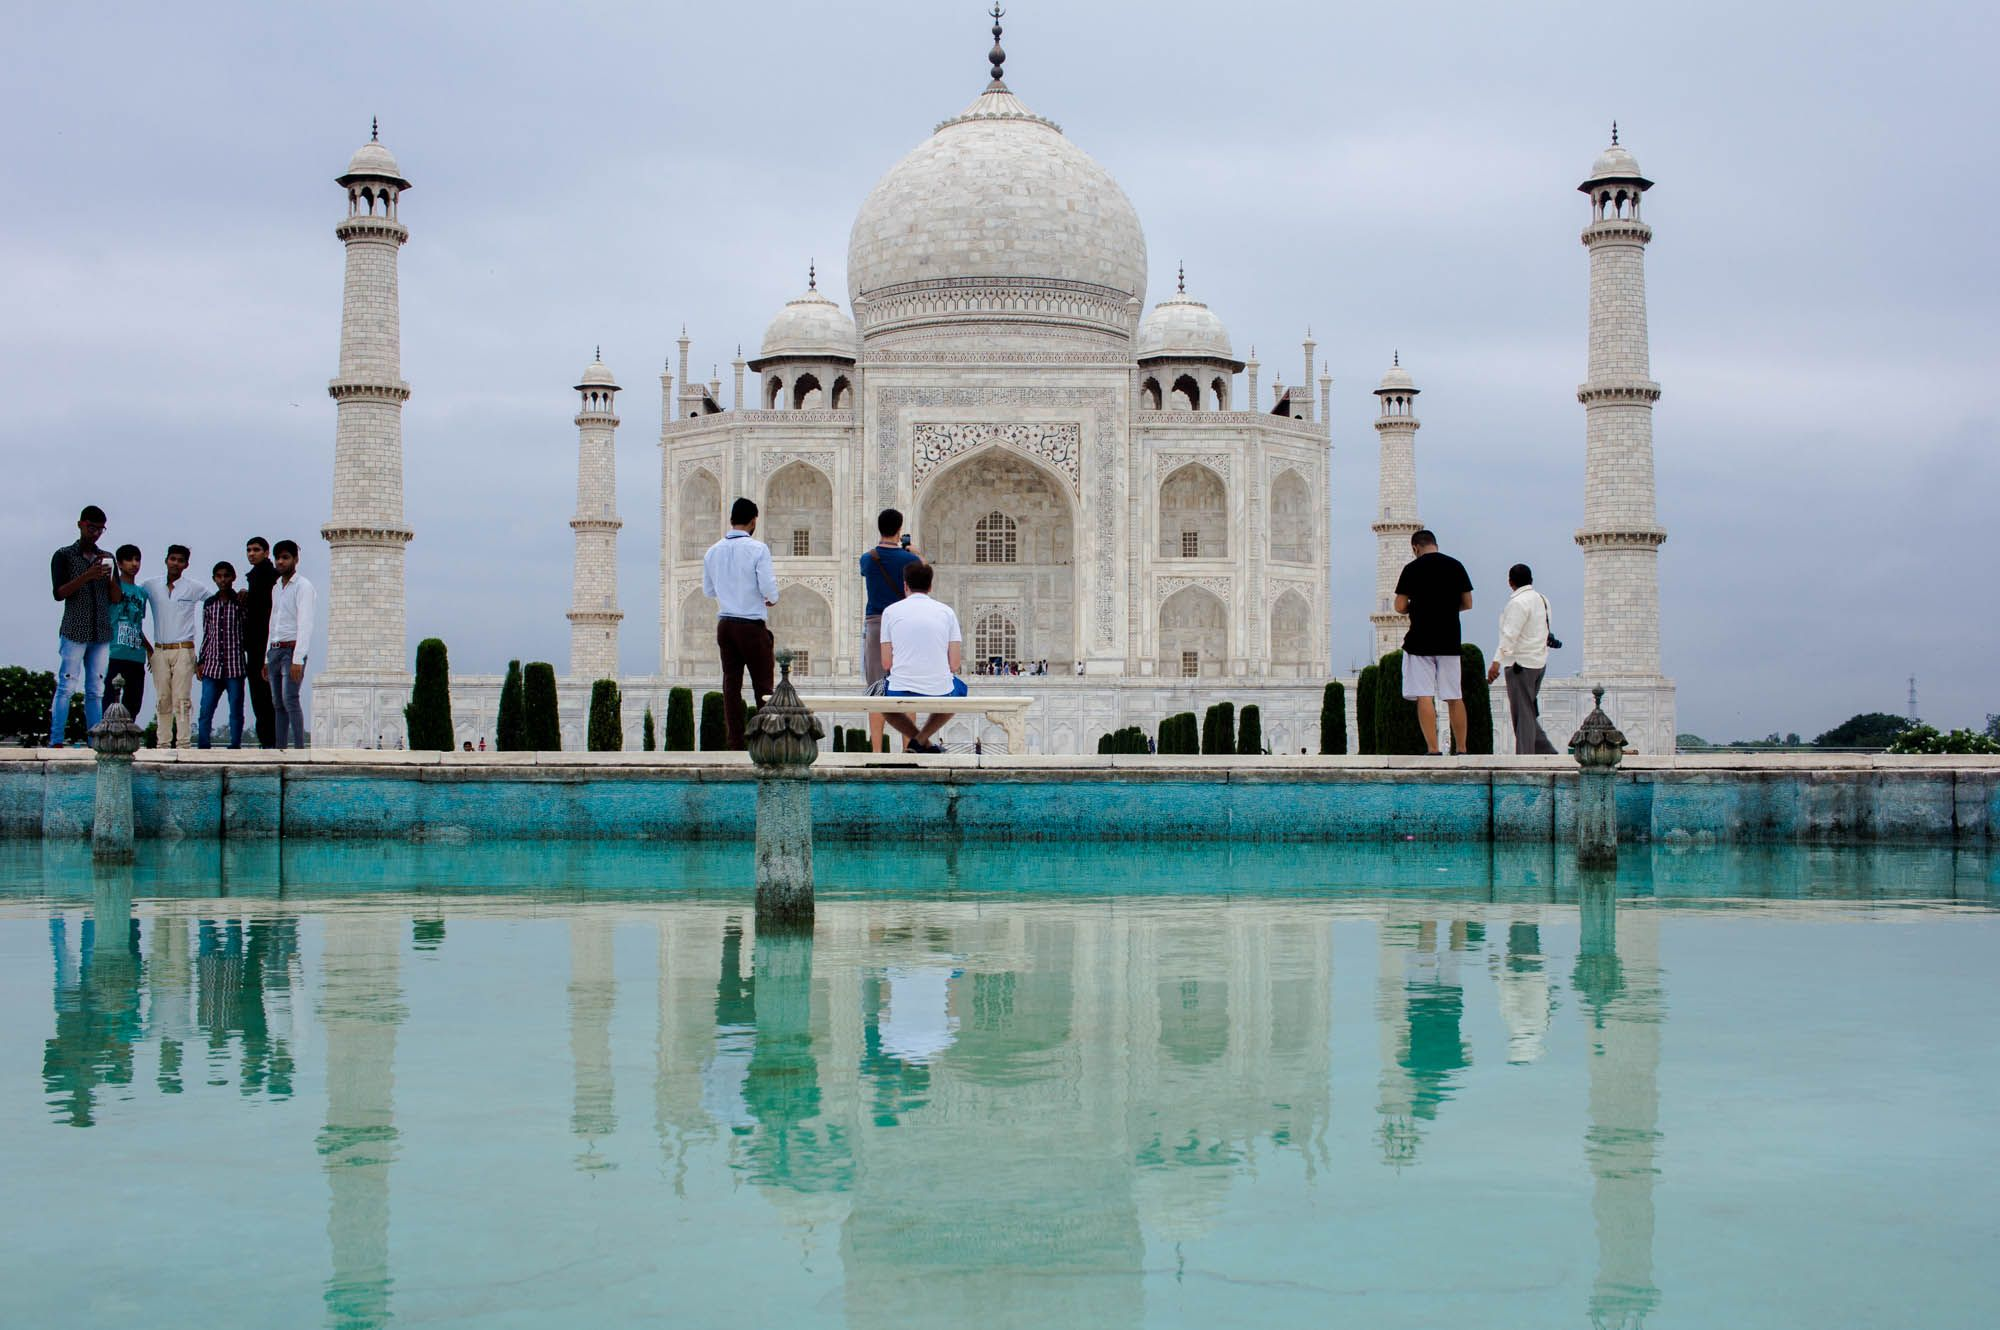 golden triangle rajasthan taj mahal jaipur delhi india tips must see kathi kamleitner travelettes-28